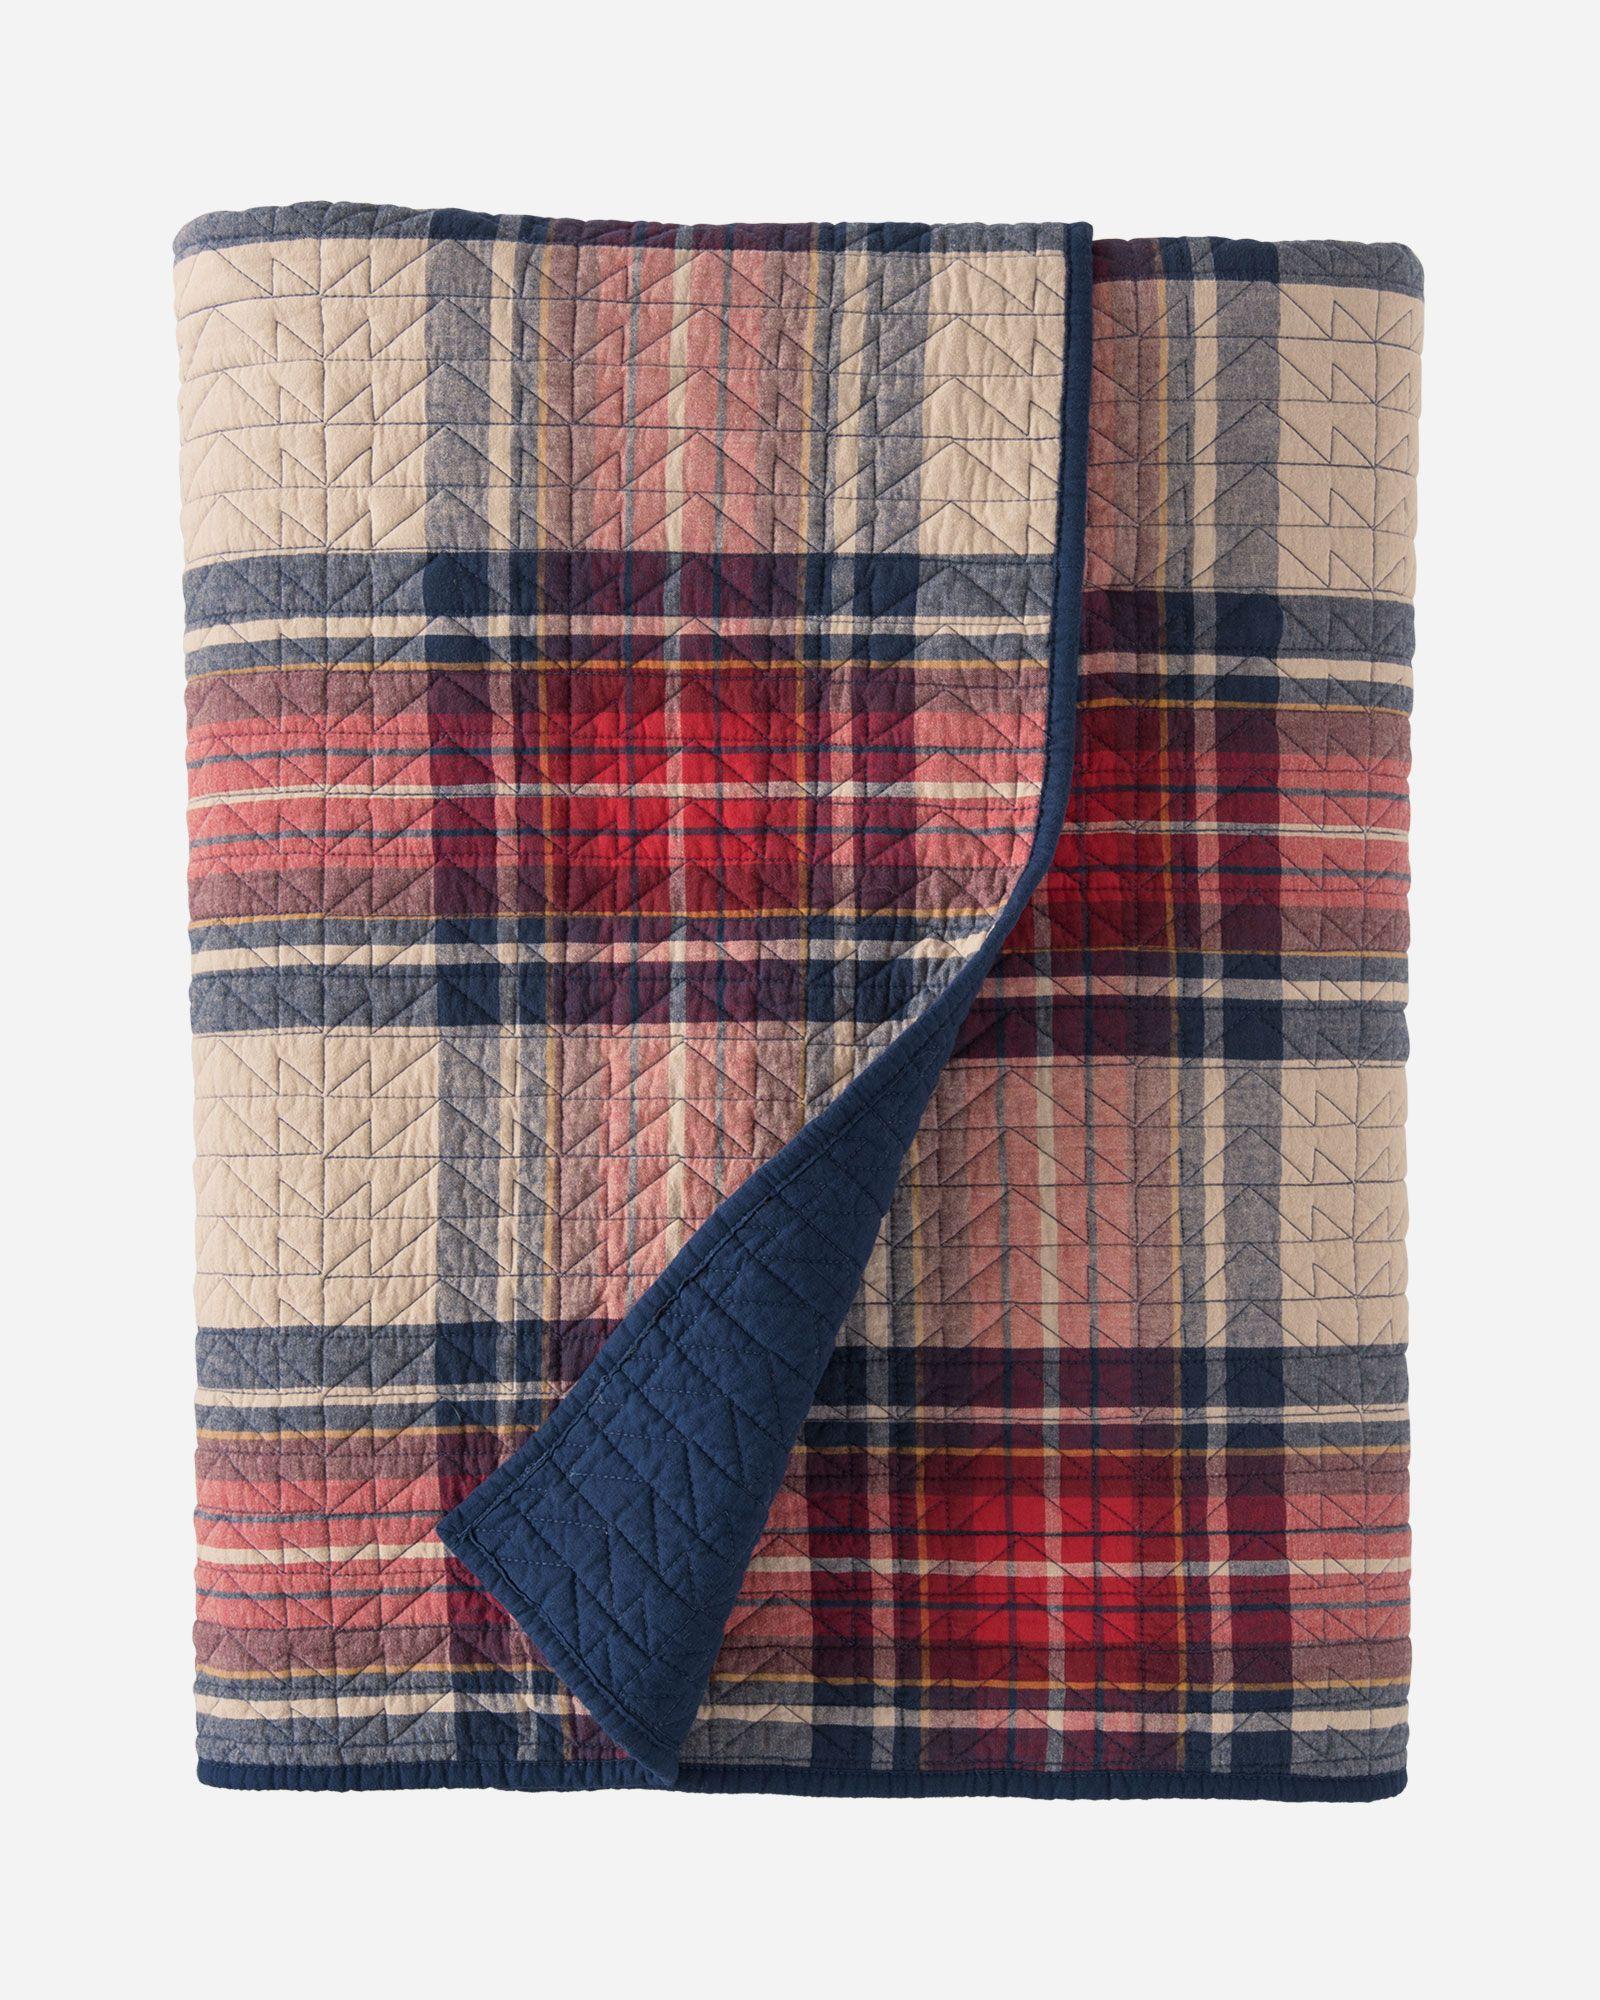 Vintage Dress Stewart Coverlet In 2020 Cotton Quilt Set Patchwork Quilts Quilted Bedspreads